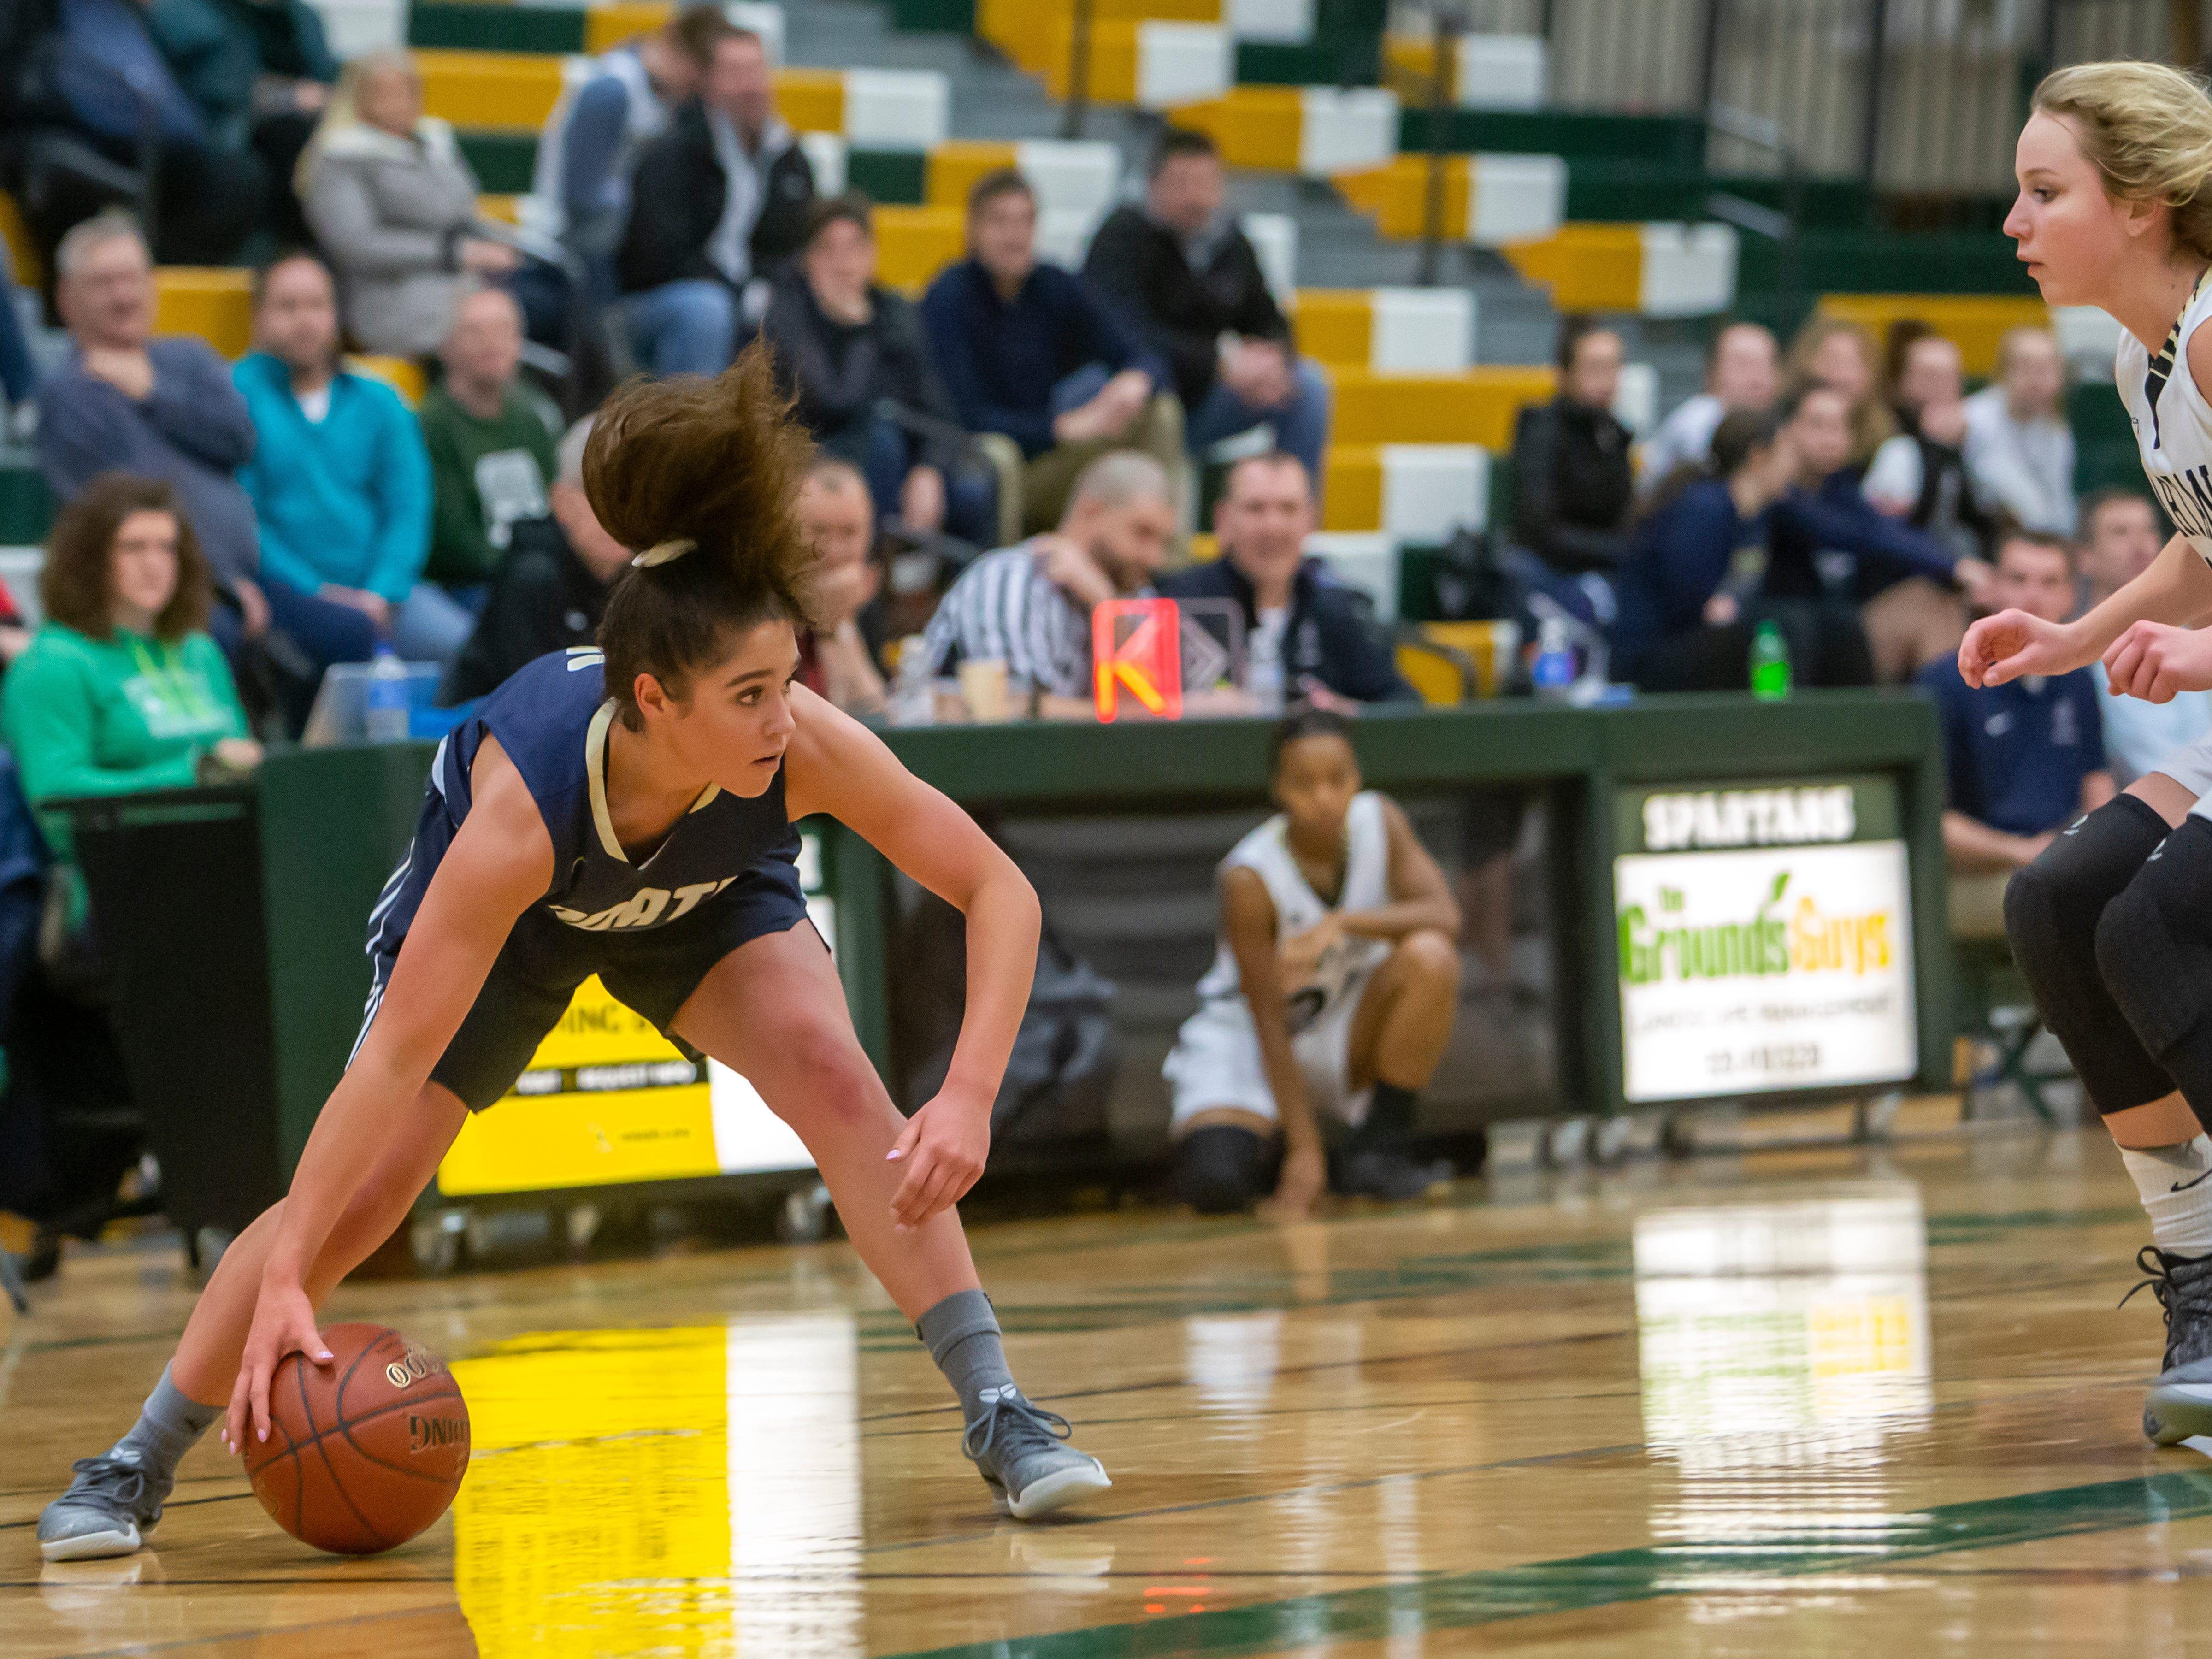 Appleton North's Niki Van Wyk picks up the loose ball during Friday's girls basketball game against Oshkosh North, February 8, 2019, in Oshkosh, Wis., at Oshkosh North High School.